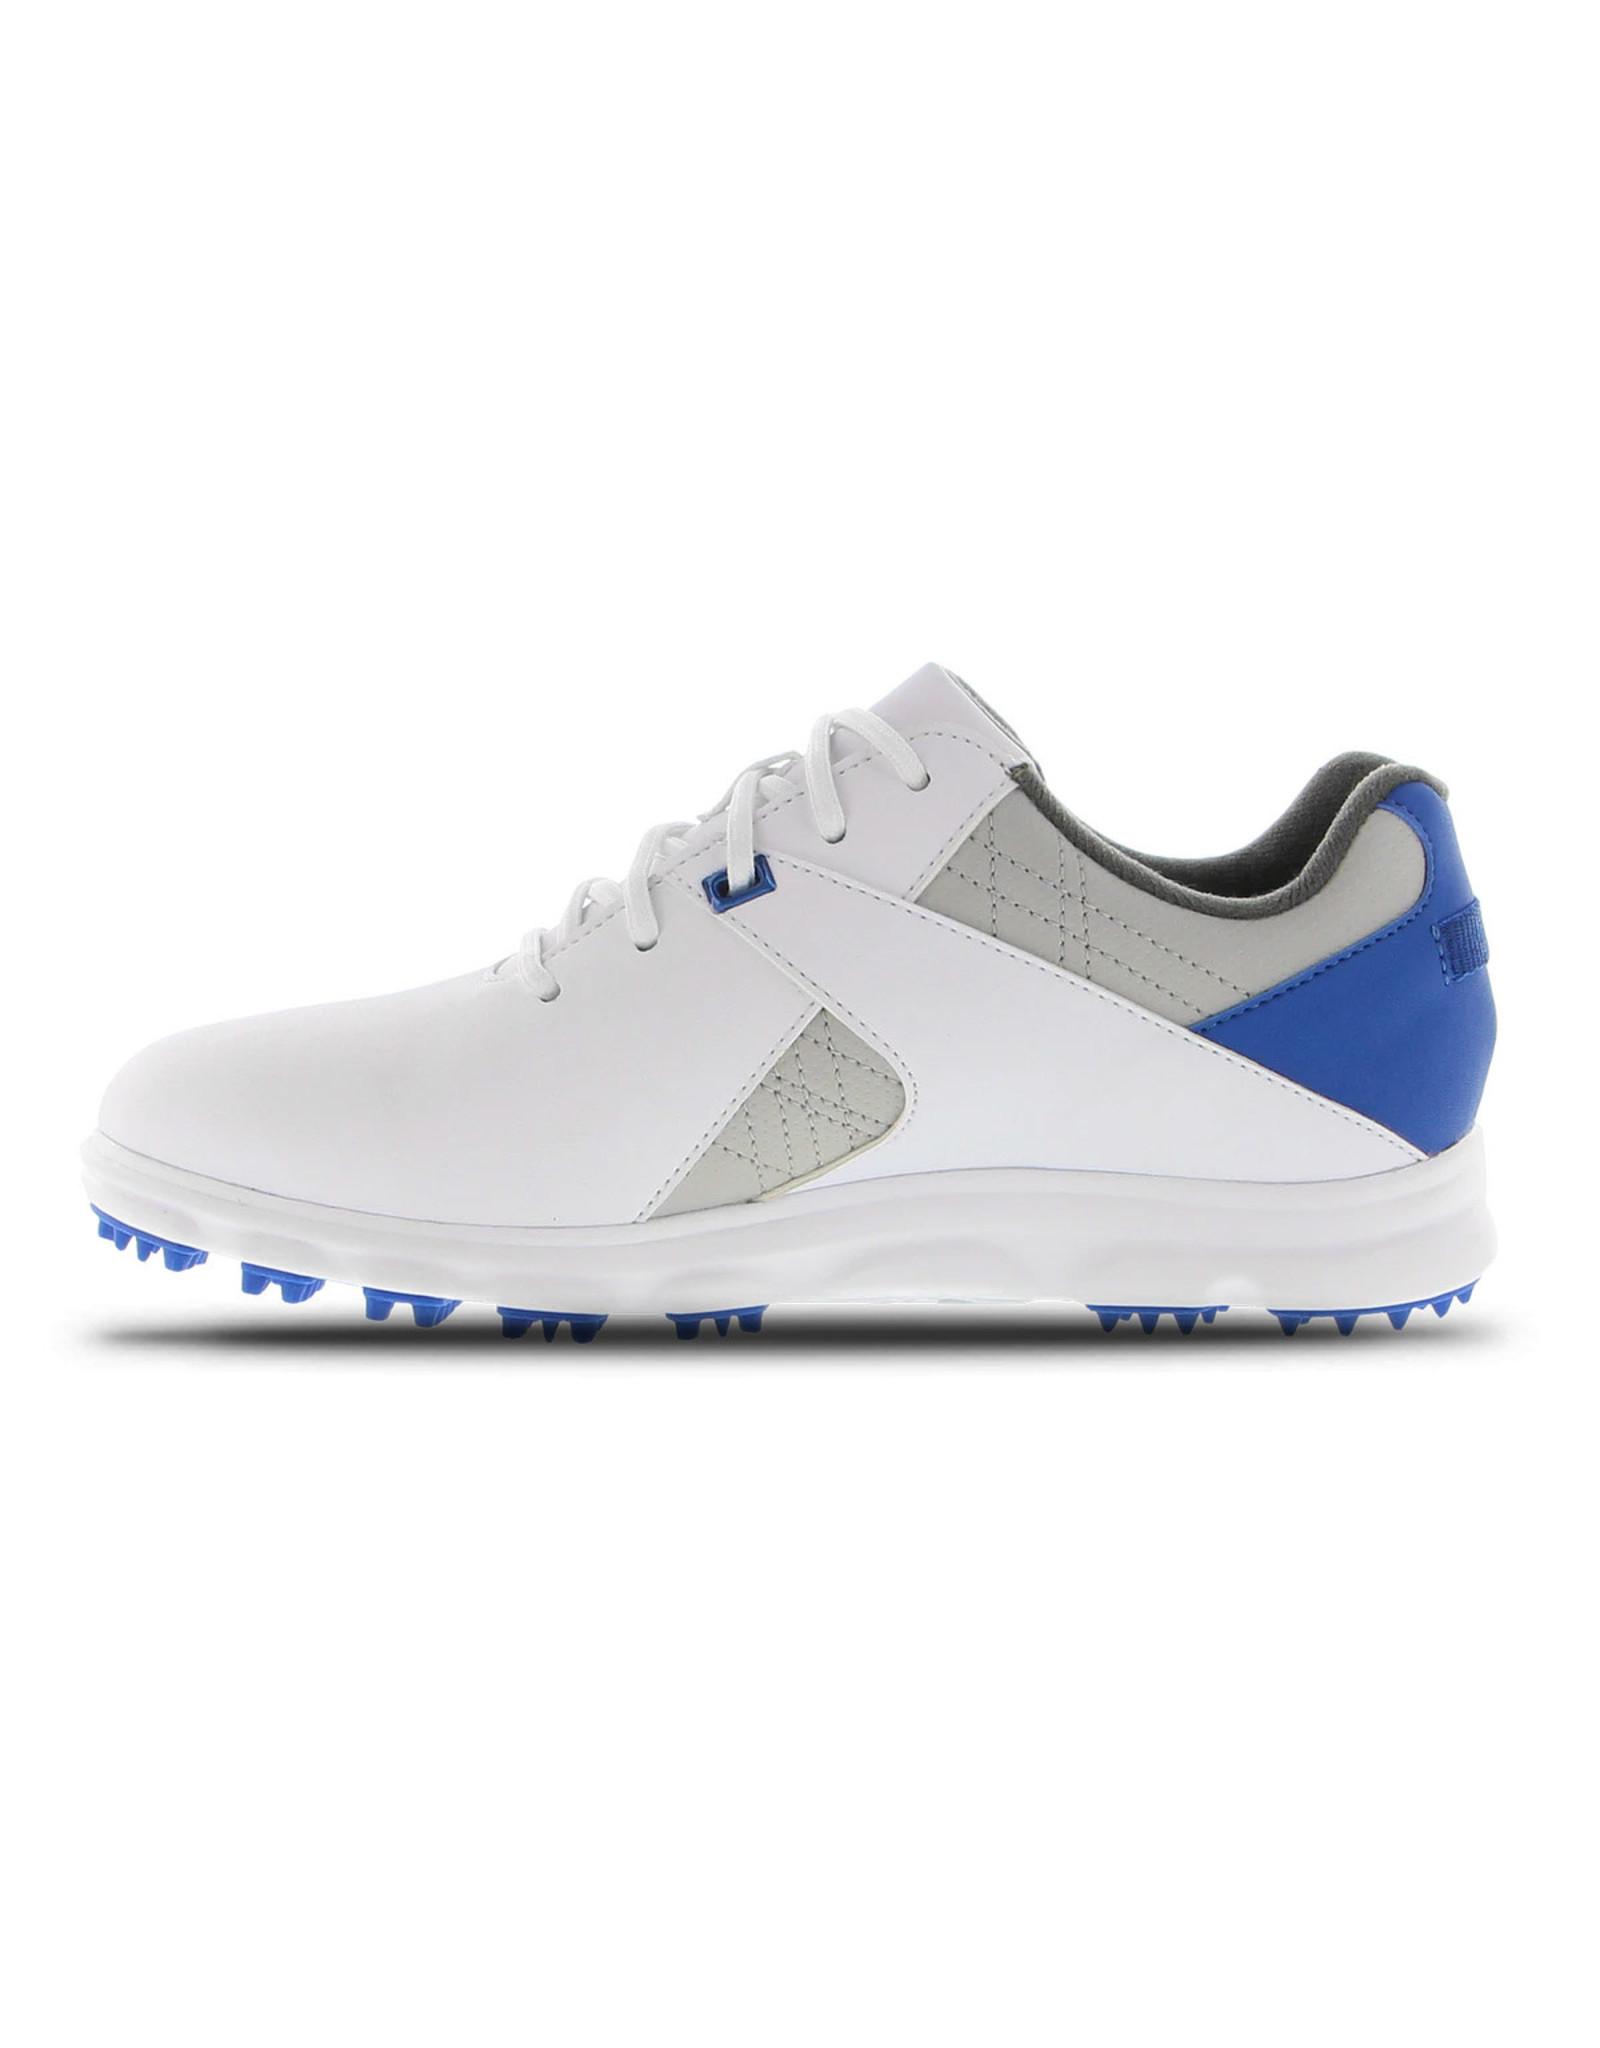 Footjoy FootJoy Jr Boys Spikeless Pro SL White/Grey/Blue